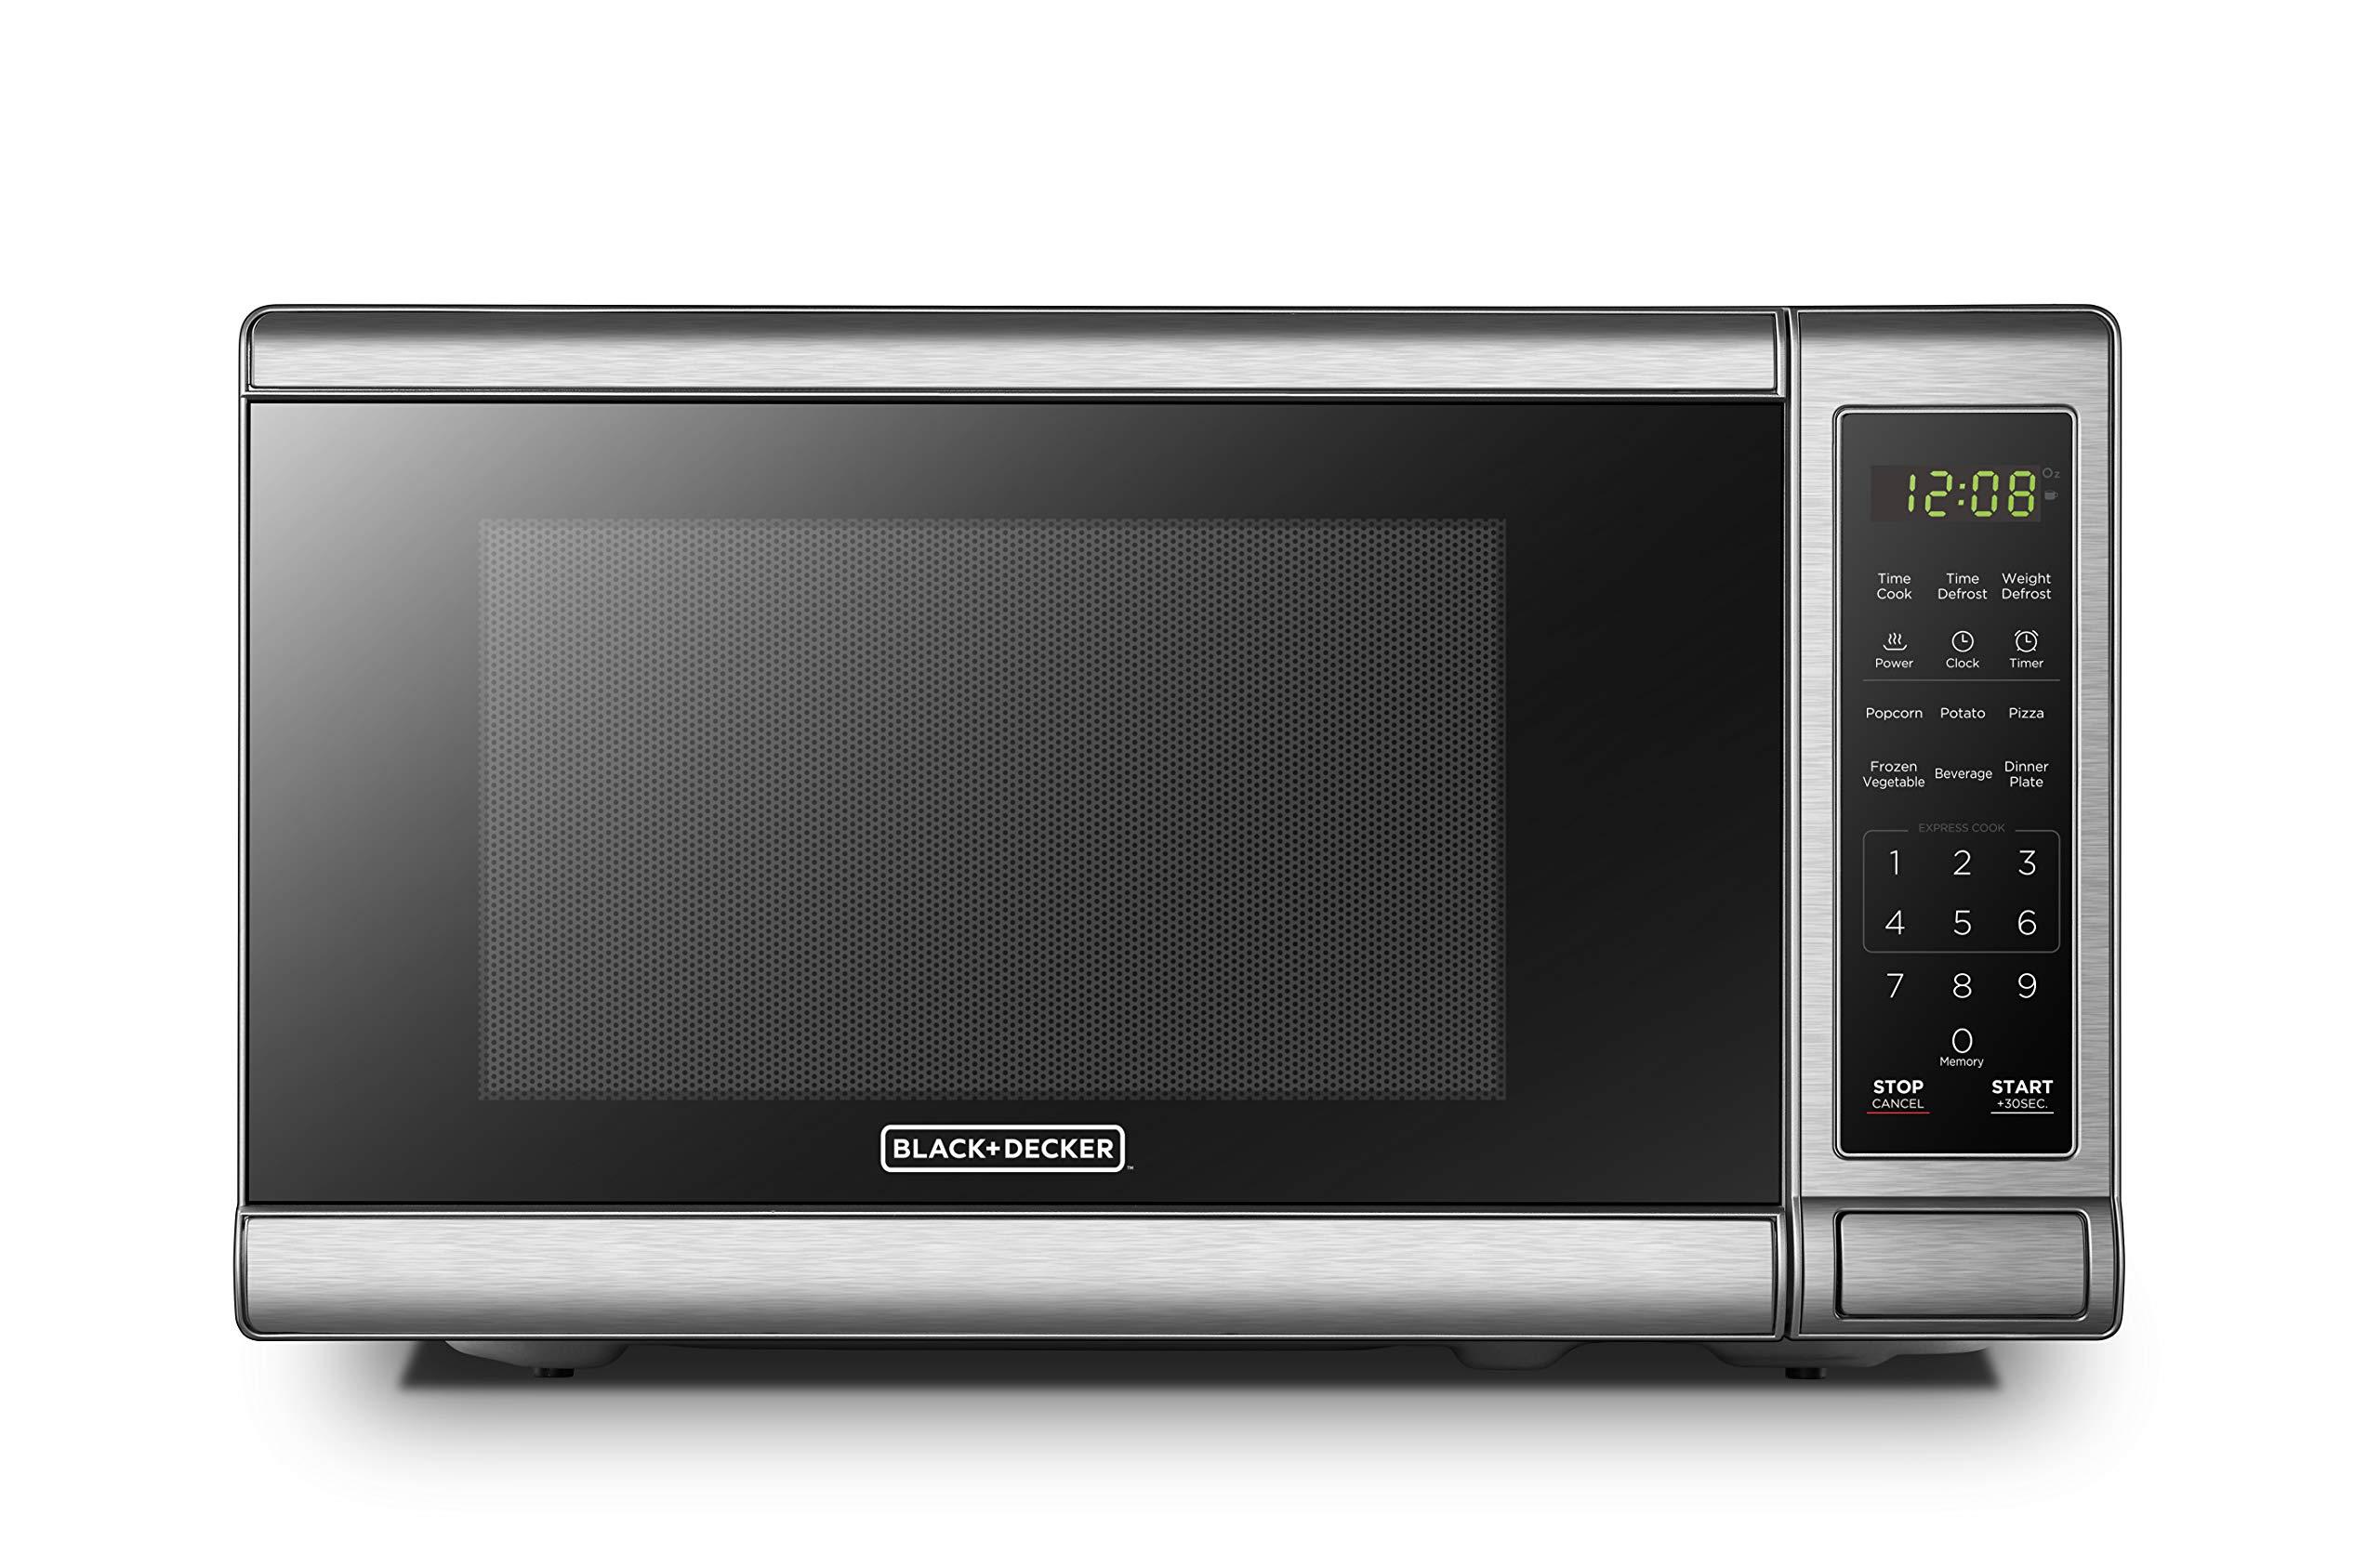 BLACK DECKER EM720CB7 Microwave Push Button